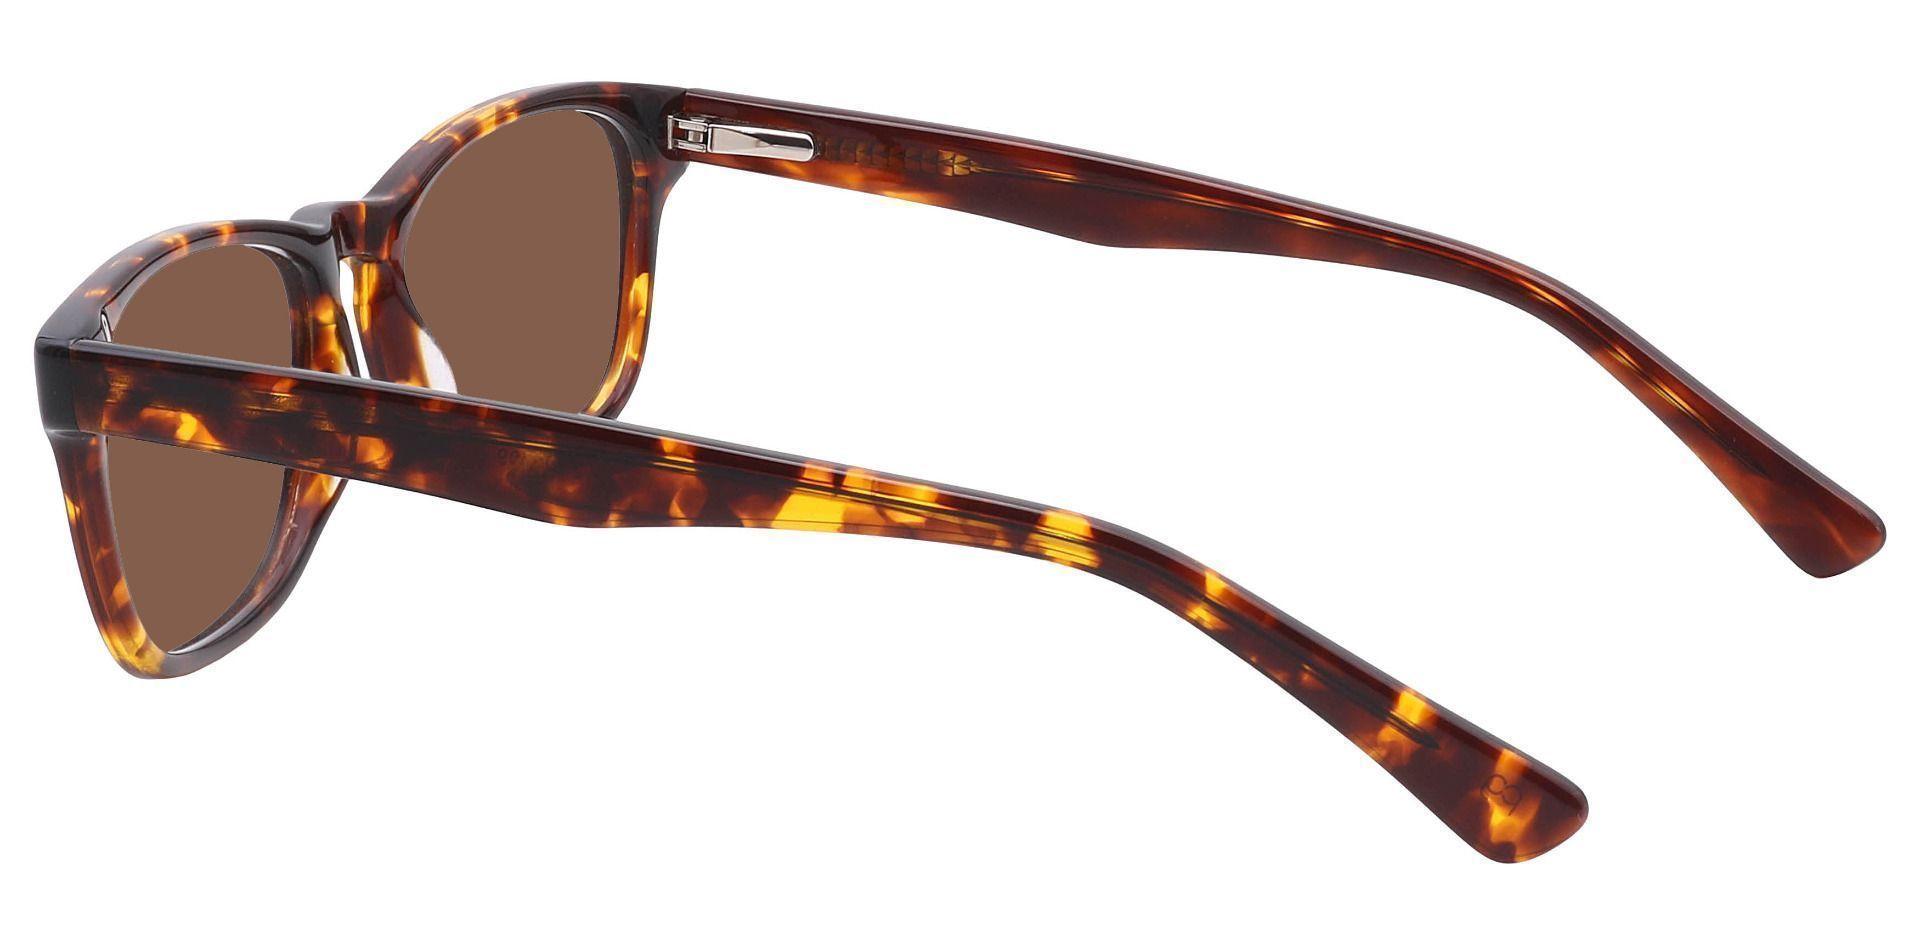 Morris Rectangle Lined Bifocal Sunglasses - Tortoise Frame With Brown Lenses